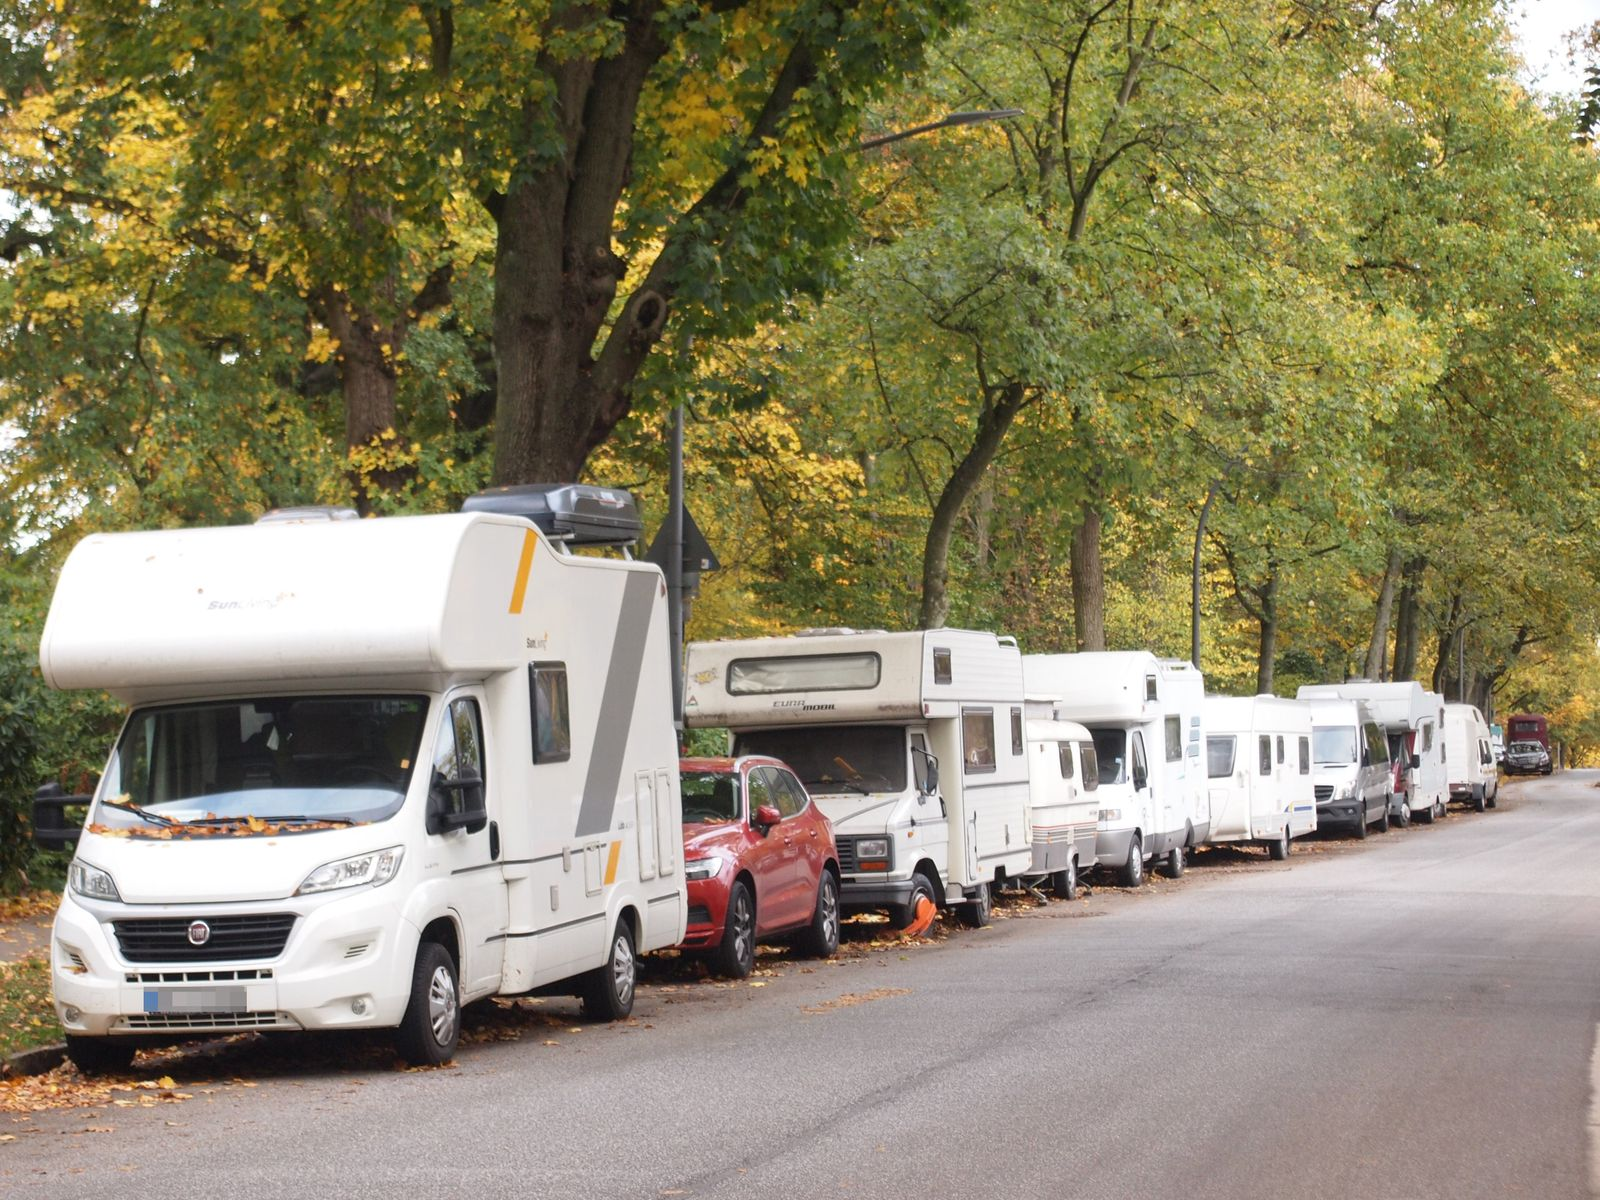 Wohnmobile in Wohngebieten